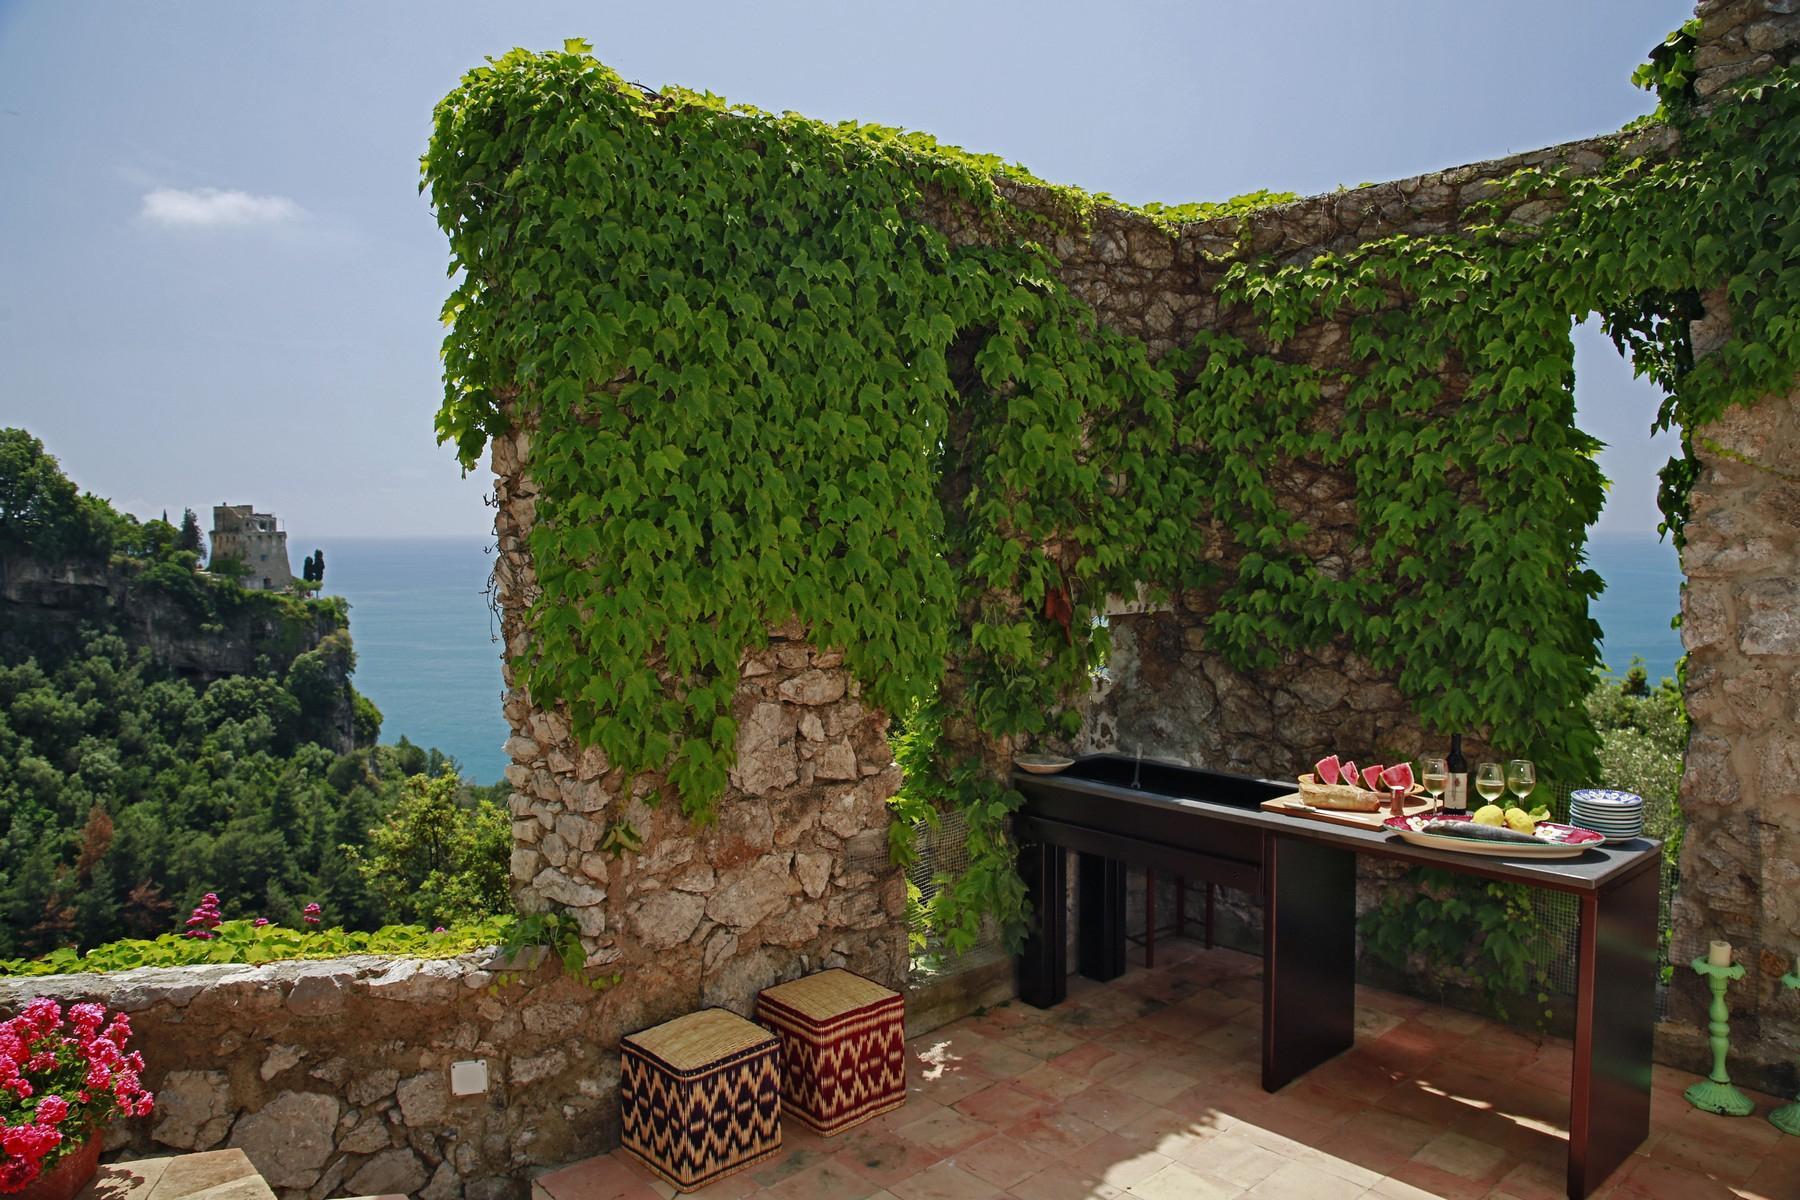 Villa pied dans l'eau in Costiera Amalfitana - 17